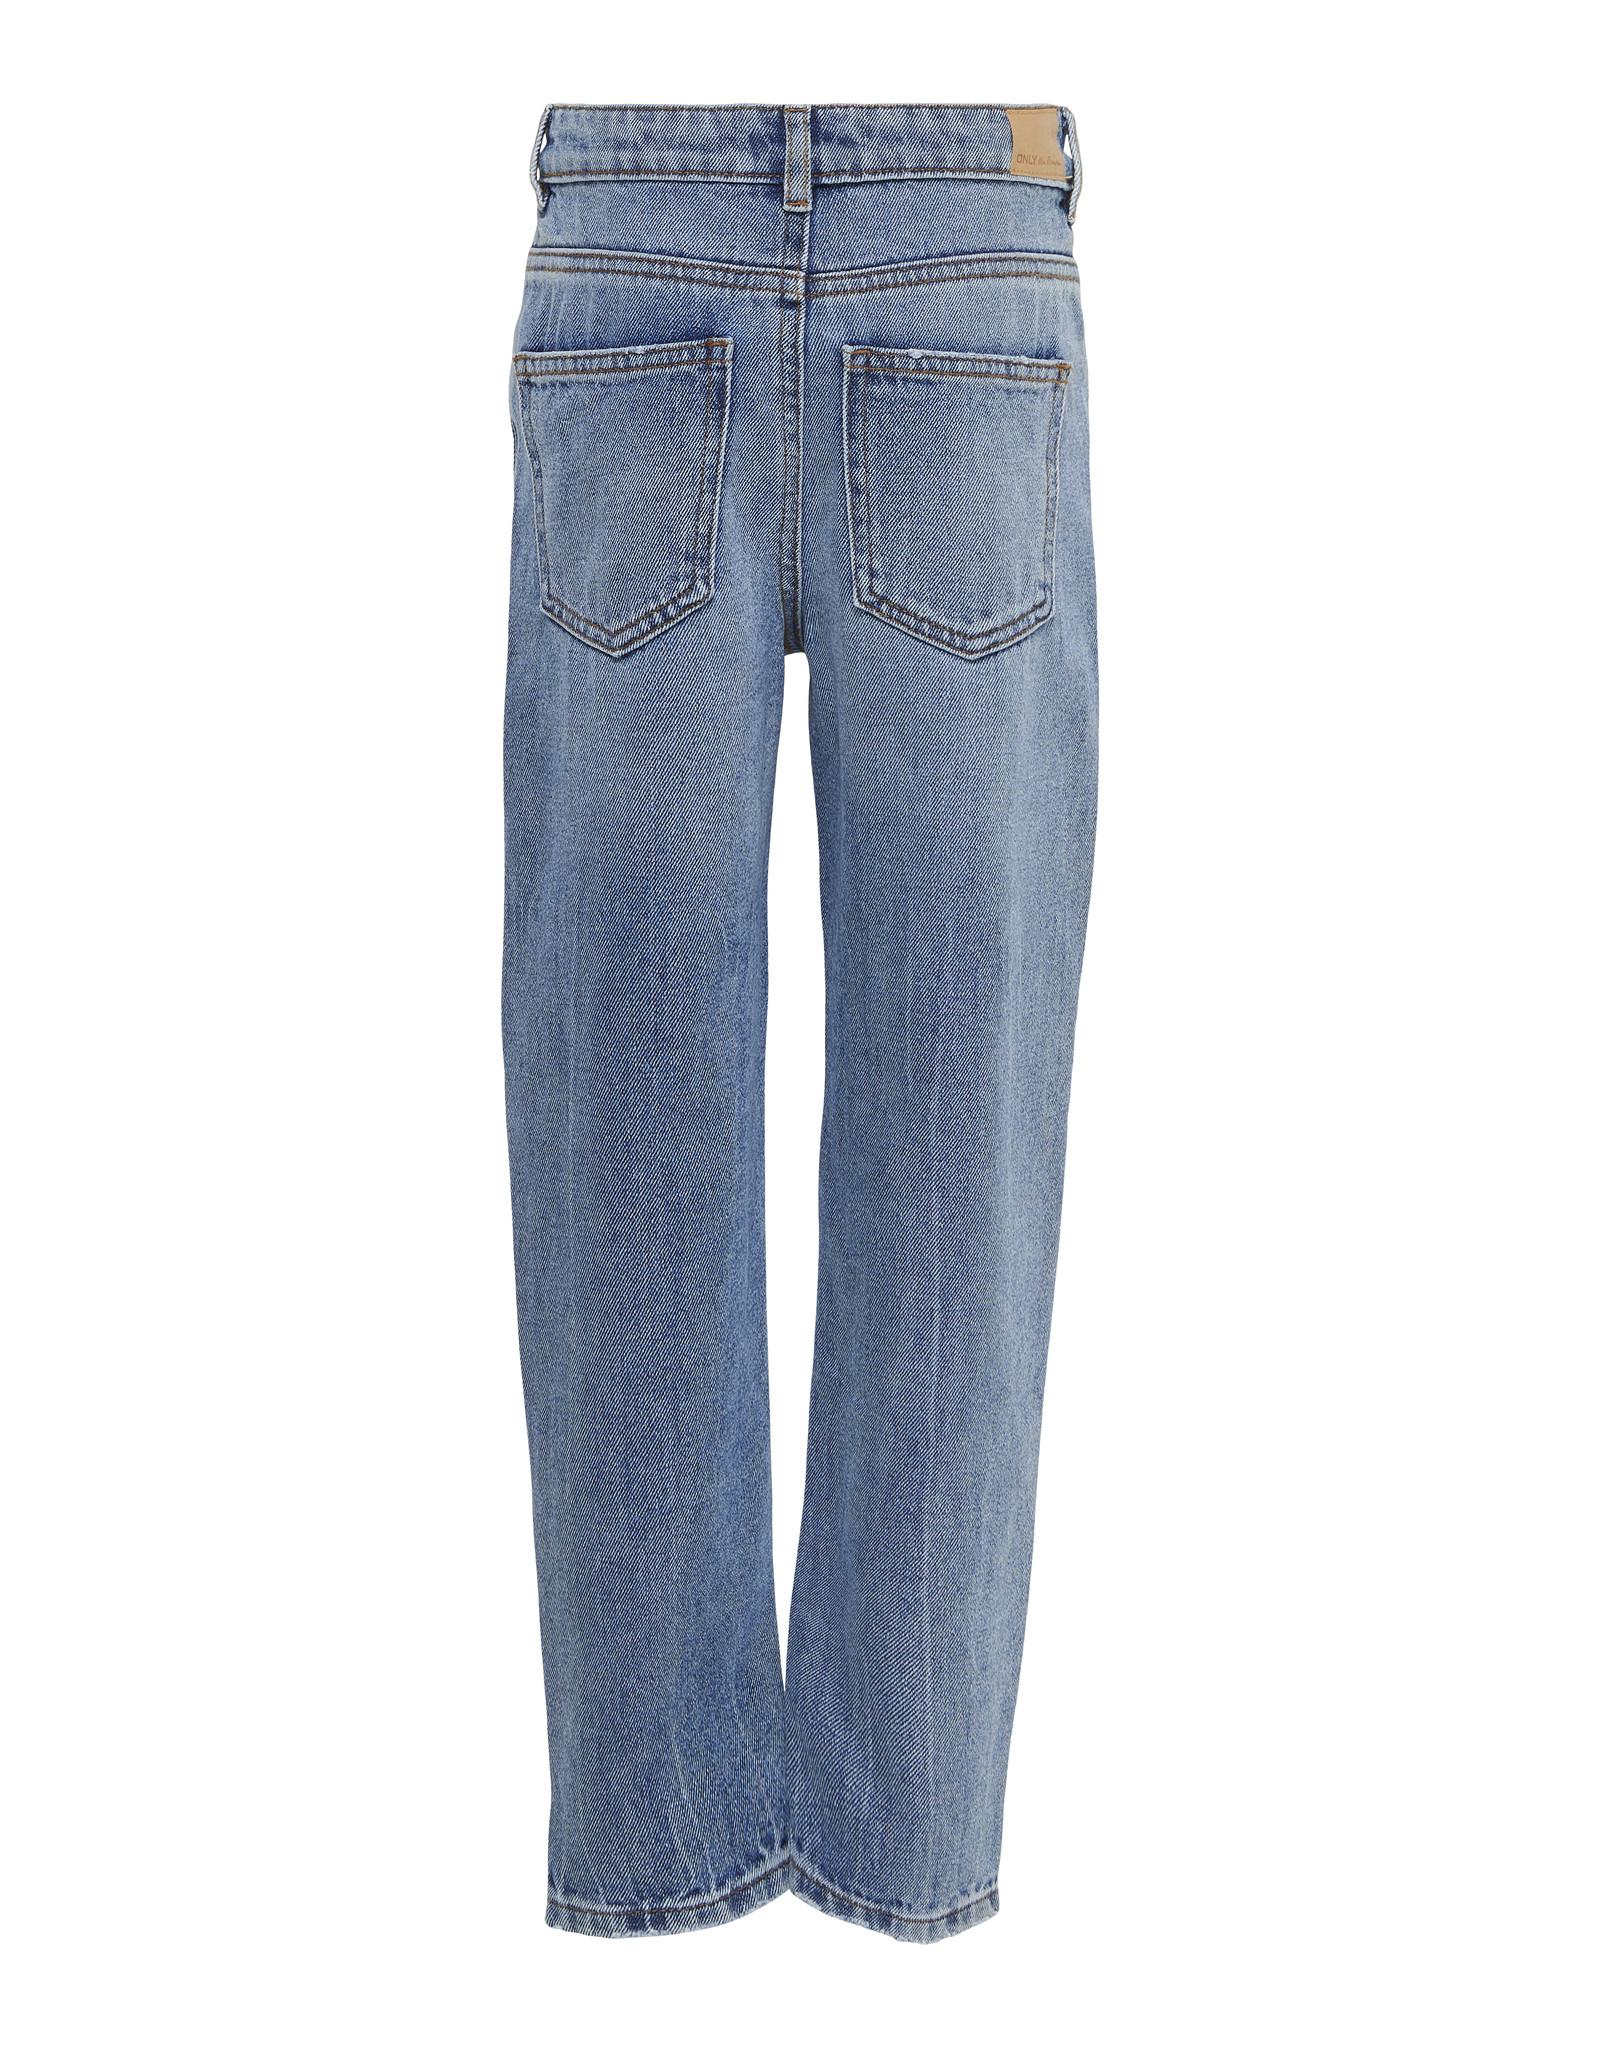 Kids Only Koncalla Mom Fit Destroy Dnm Jeans Azg Light Blue Denim